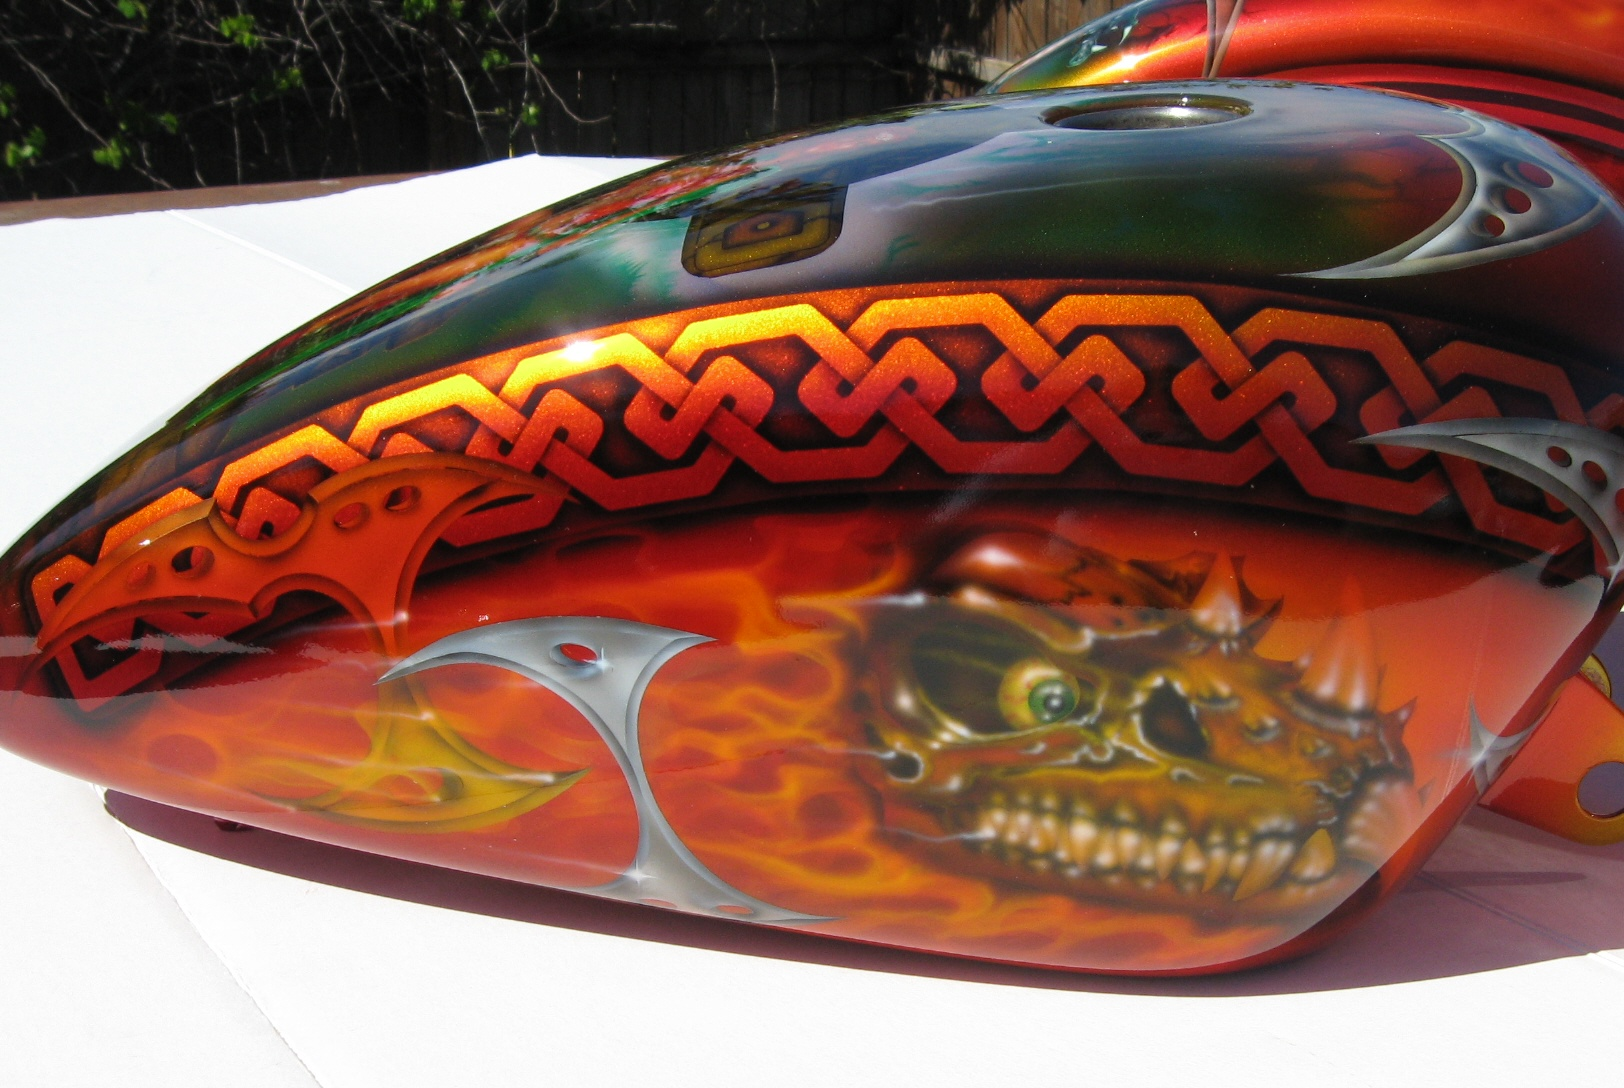 Harley-Davidson-Fantasy-True-Flame-Dragon-Skull-gastank